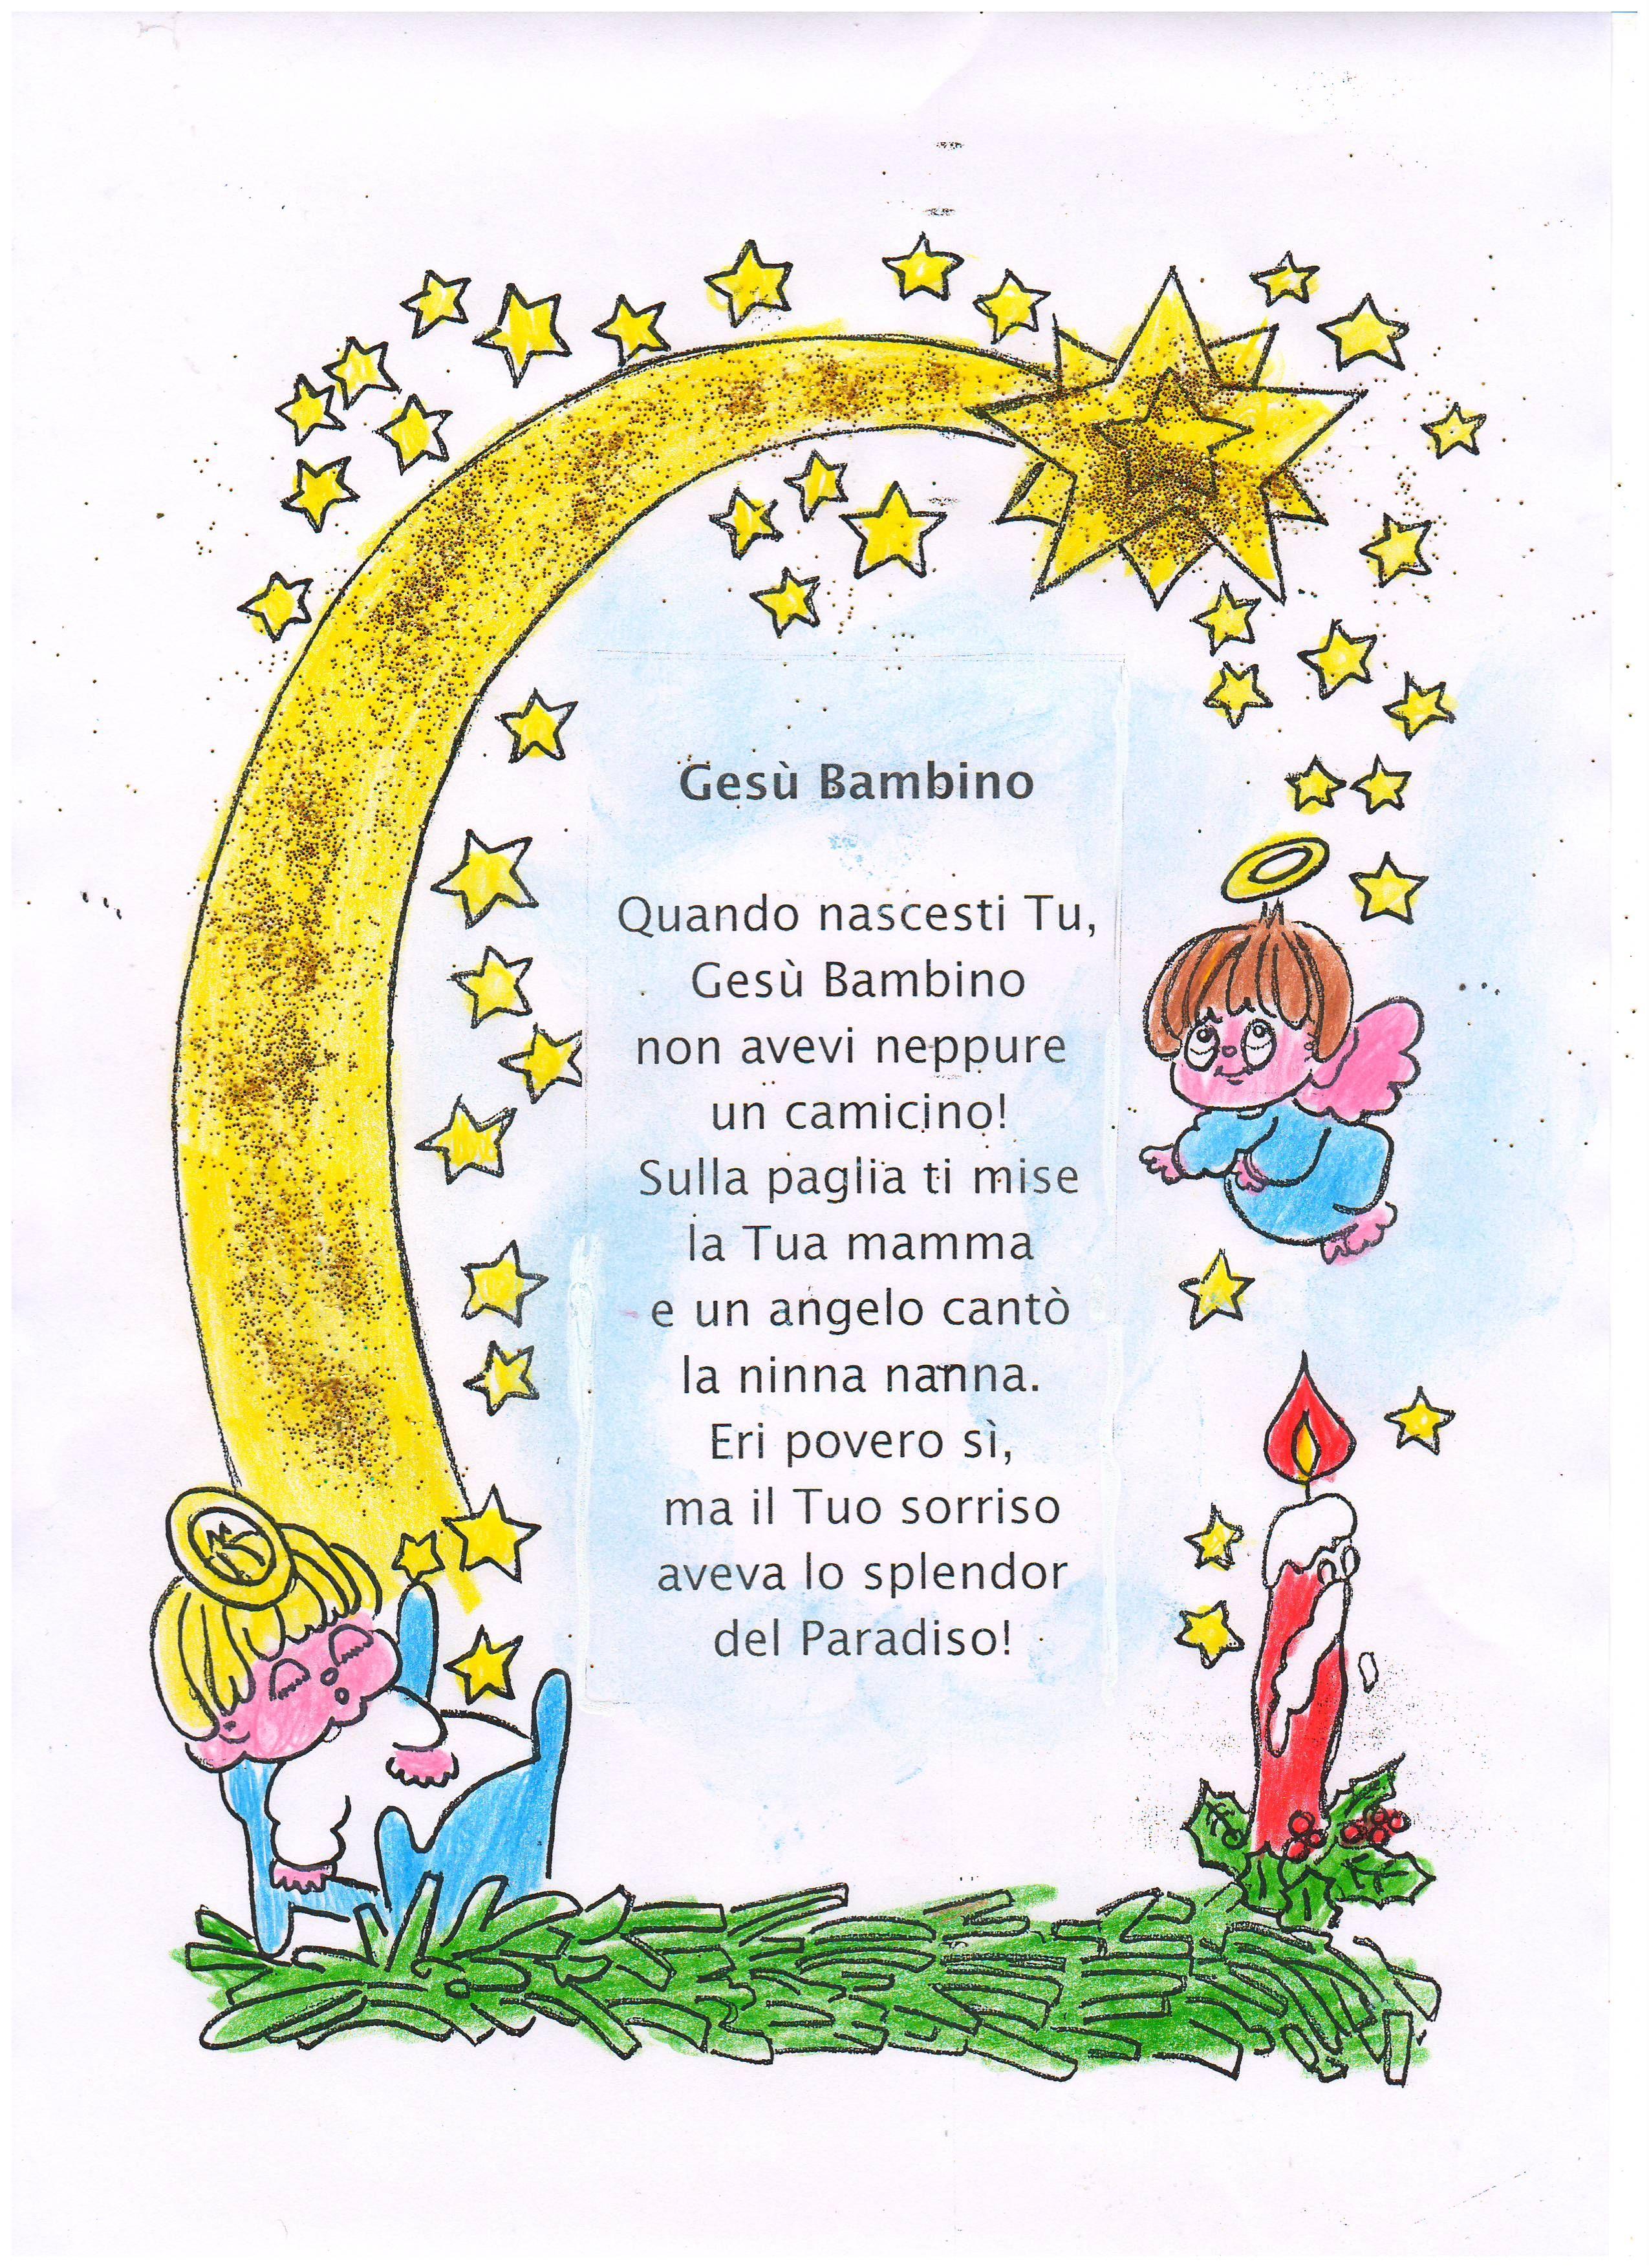 Valentina buona notte babbo - 1 part 1